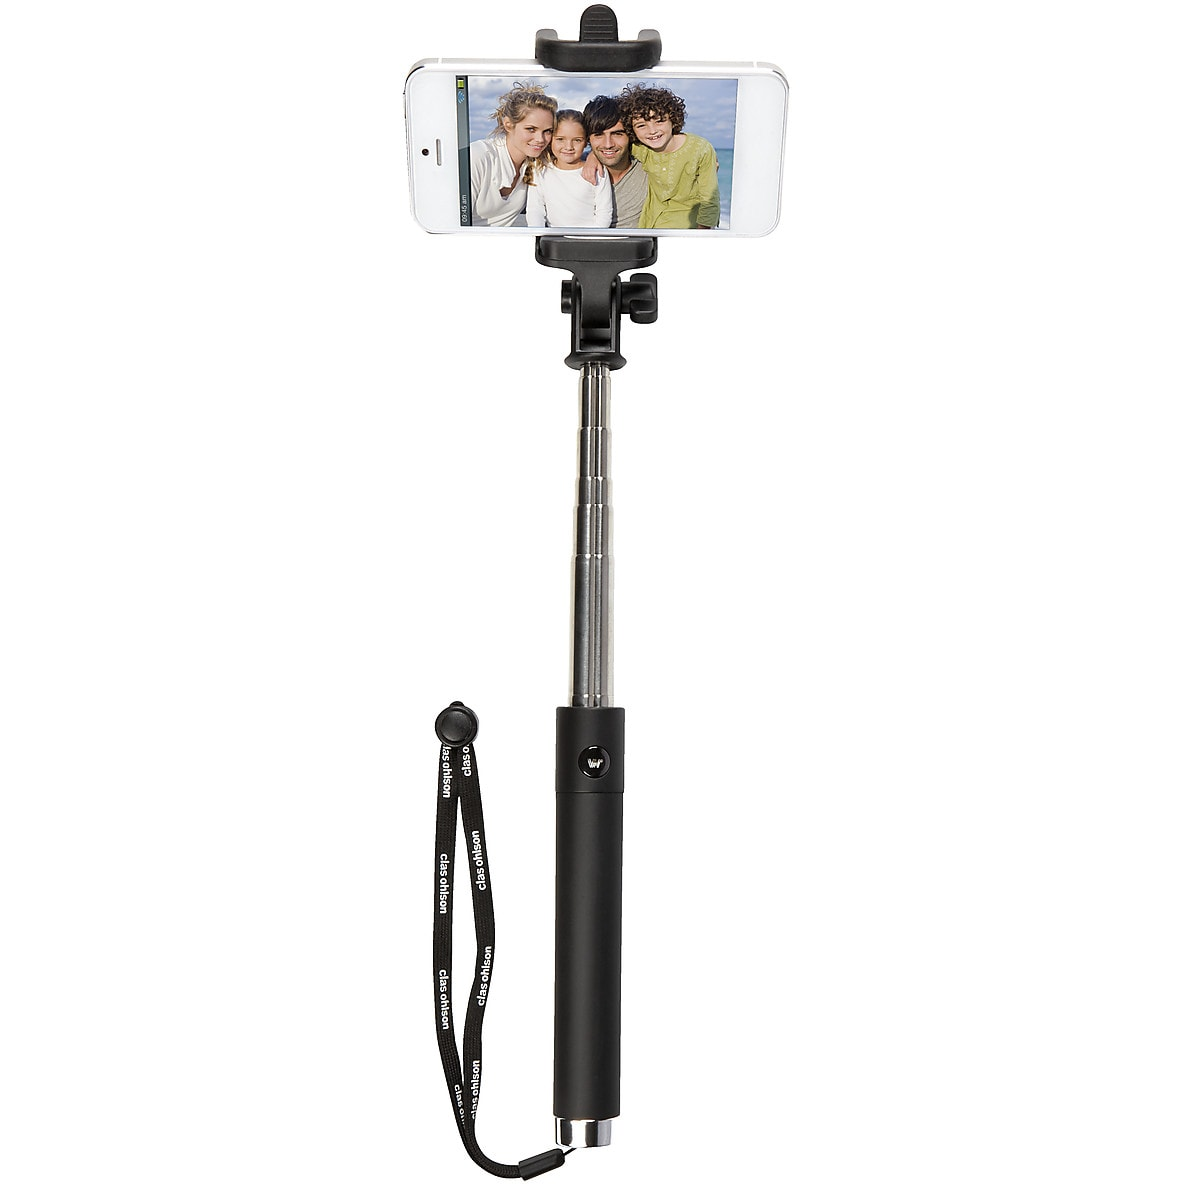 Selfie Stick with Shutter Button